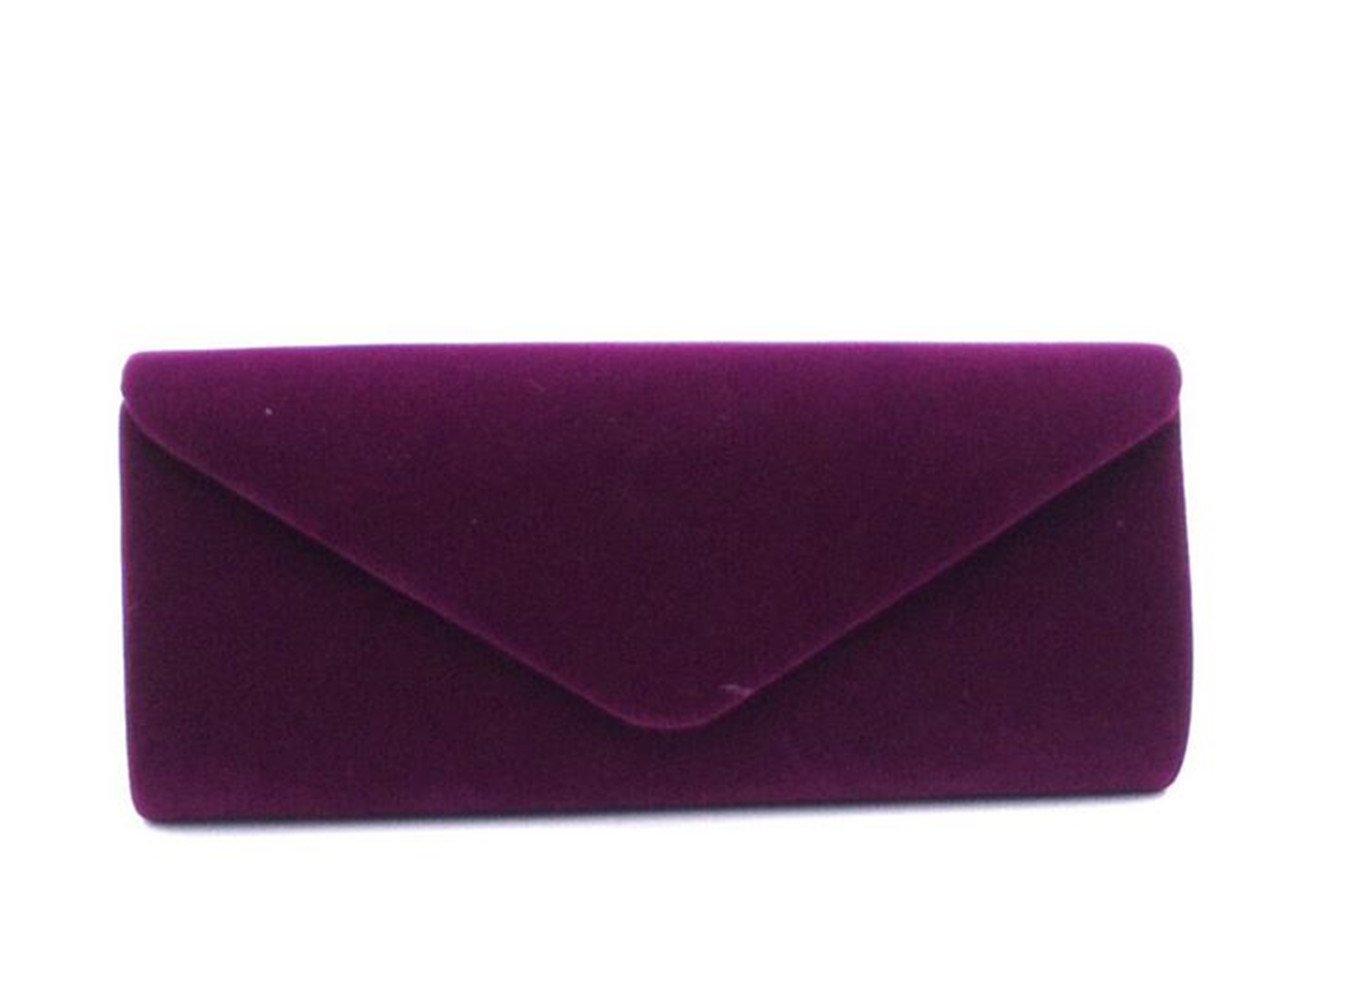 Nodykka Clutch Purses For Women Evening Bags Shoulder Envelope Party Cross Body Handbags (Purple) by Nodykka (Image #1)